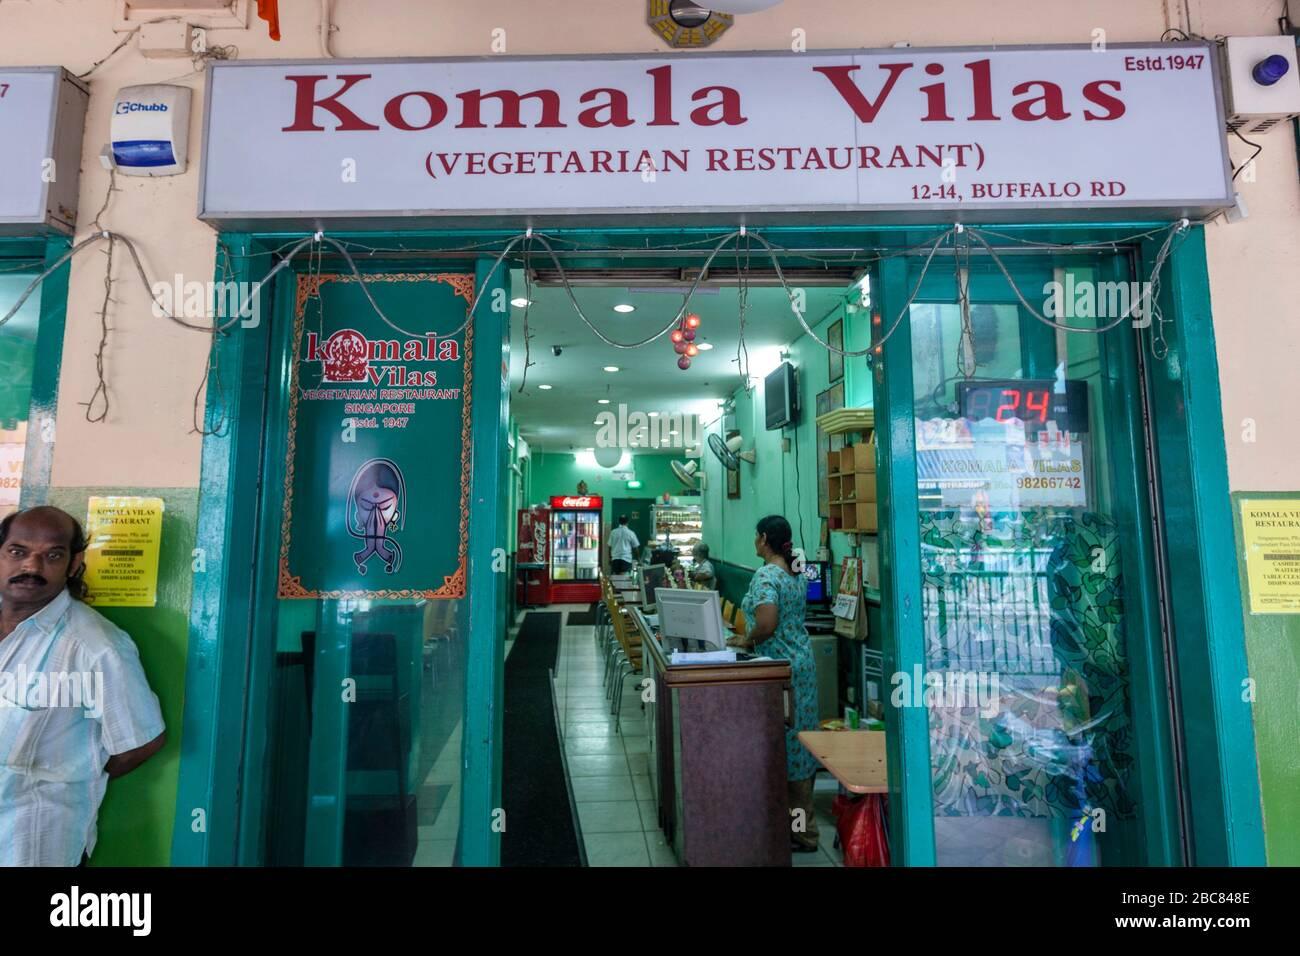 komala-vilas-vegetarian-restaurant-in-bu